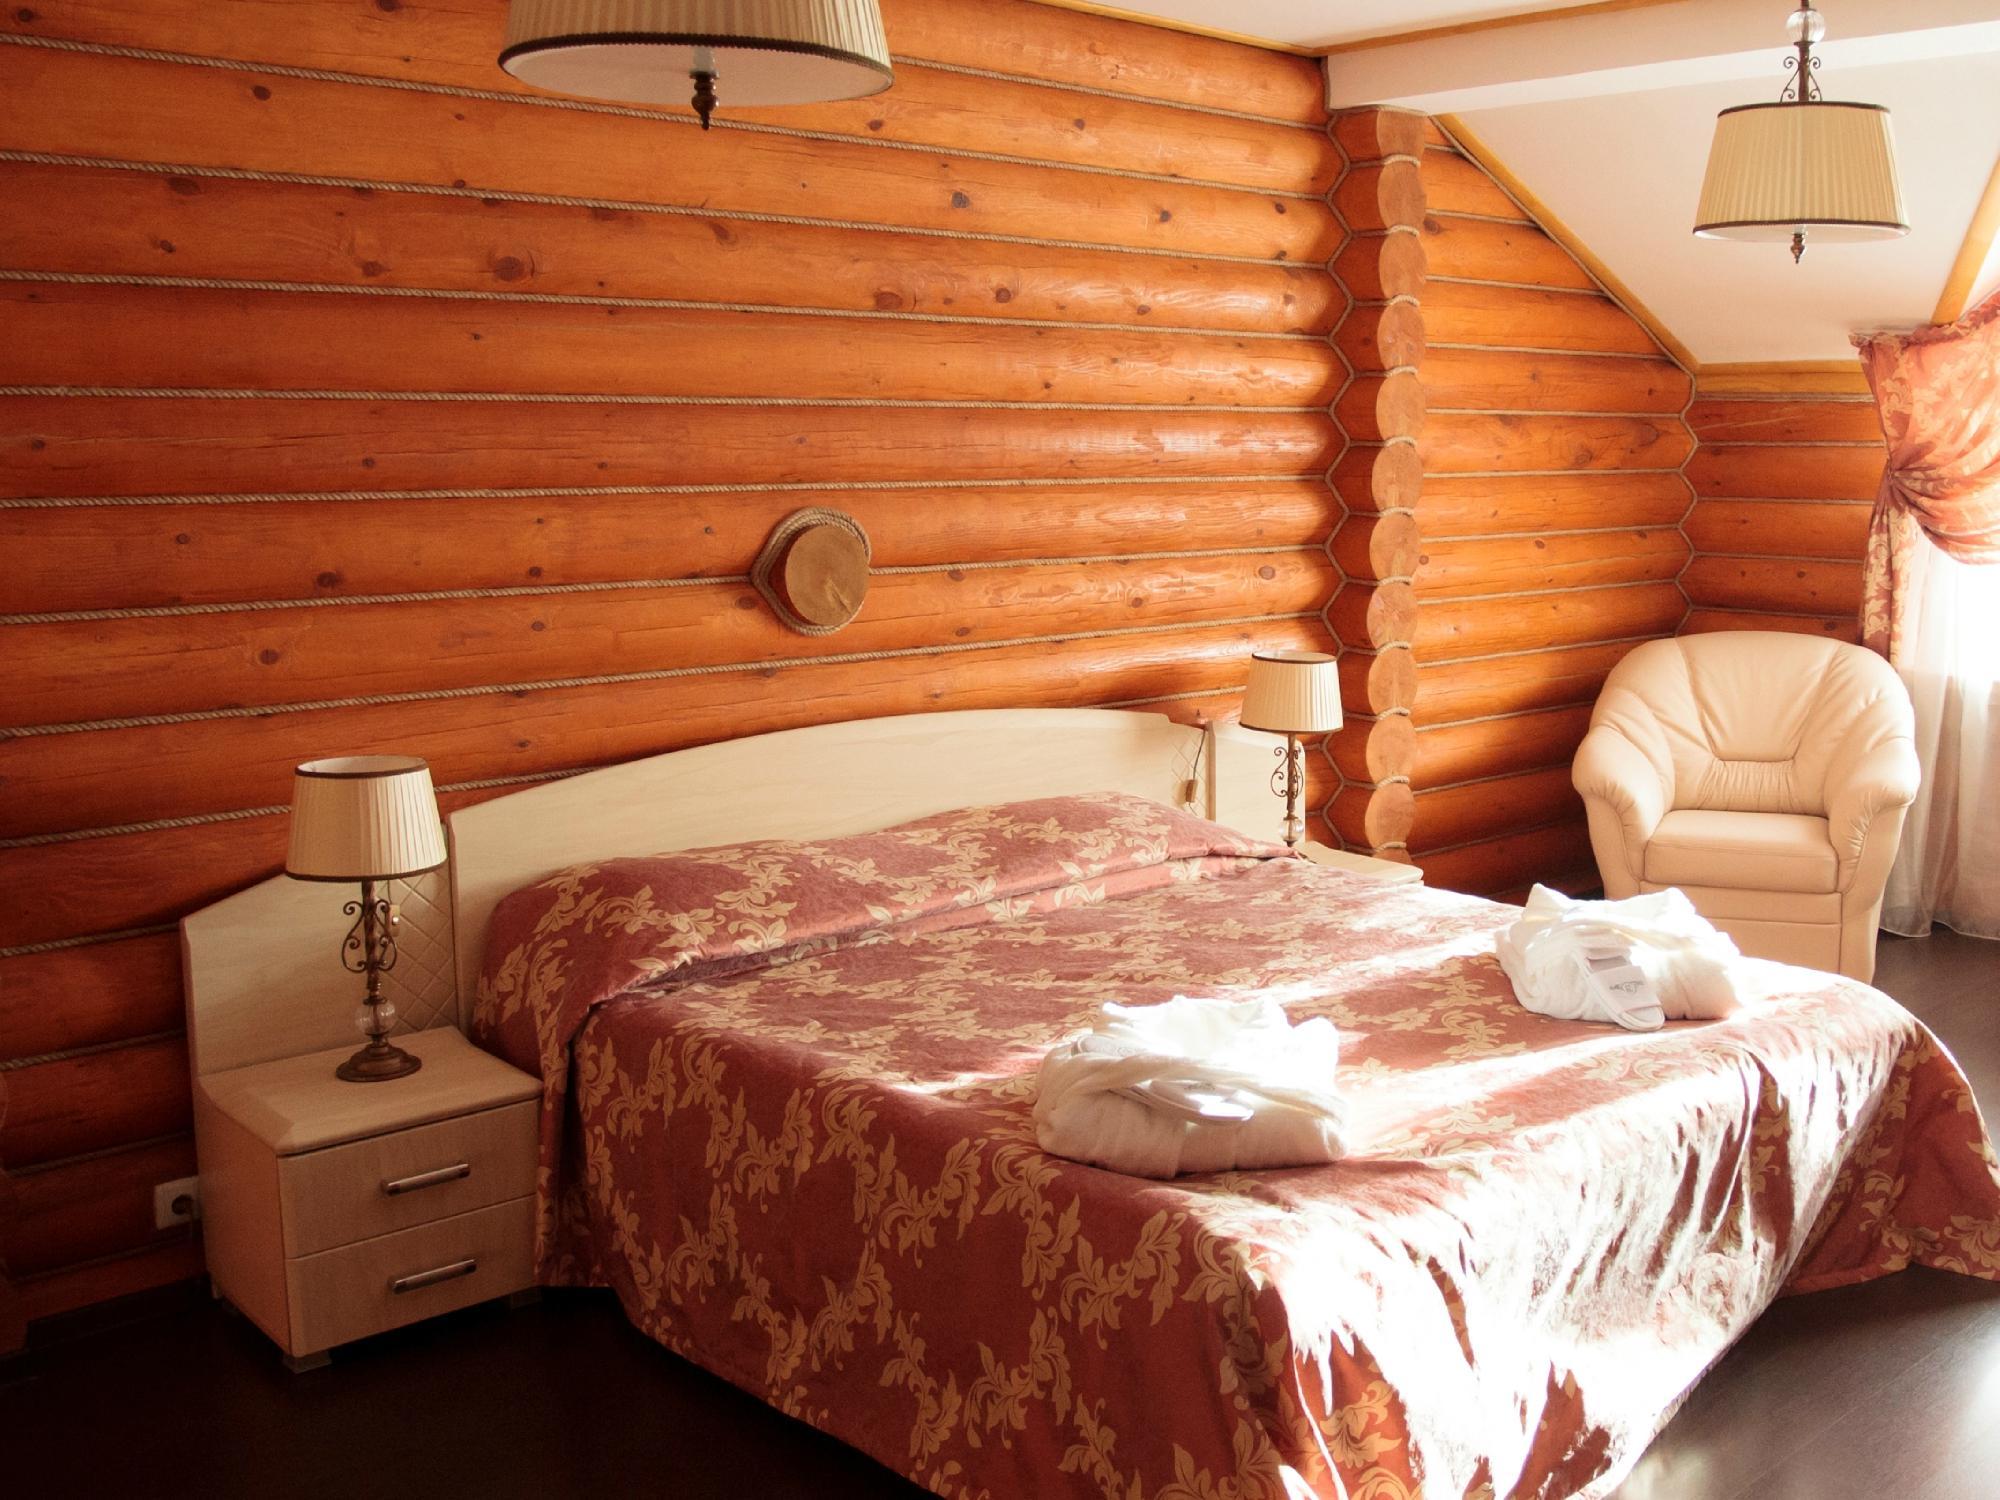 Park-hotel Vasilievsky